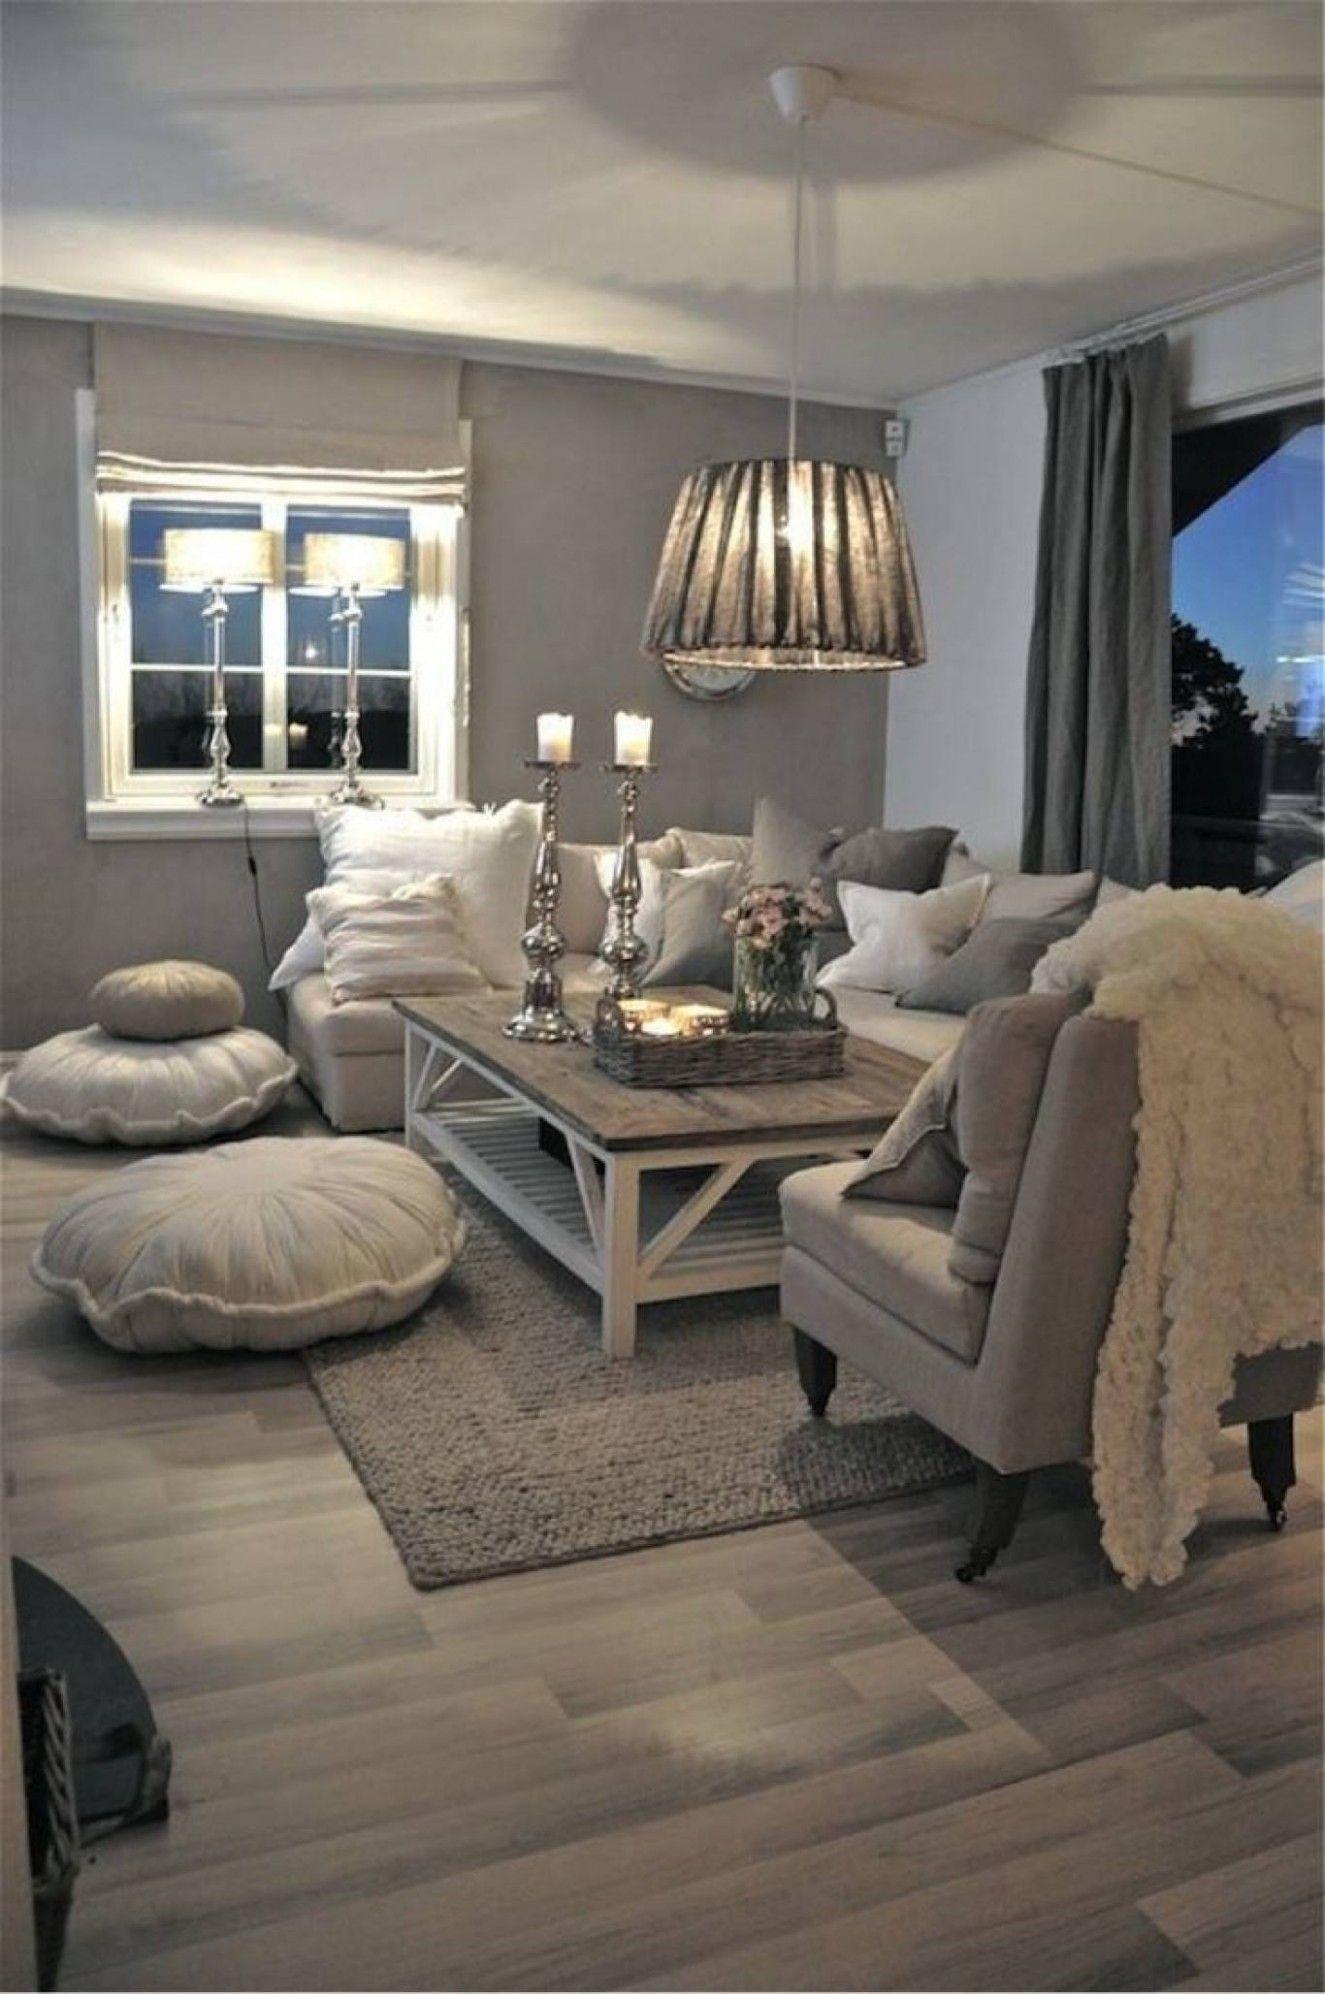 Grey Rustic Living Room Ideas Home Design Blue And Black Rustic Living Room Grey Couch In 2020 Living Room Grey Rustic Living Room Trendy Living Rooms #rustic #white #living #room